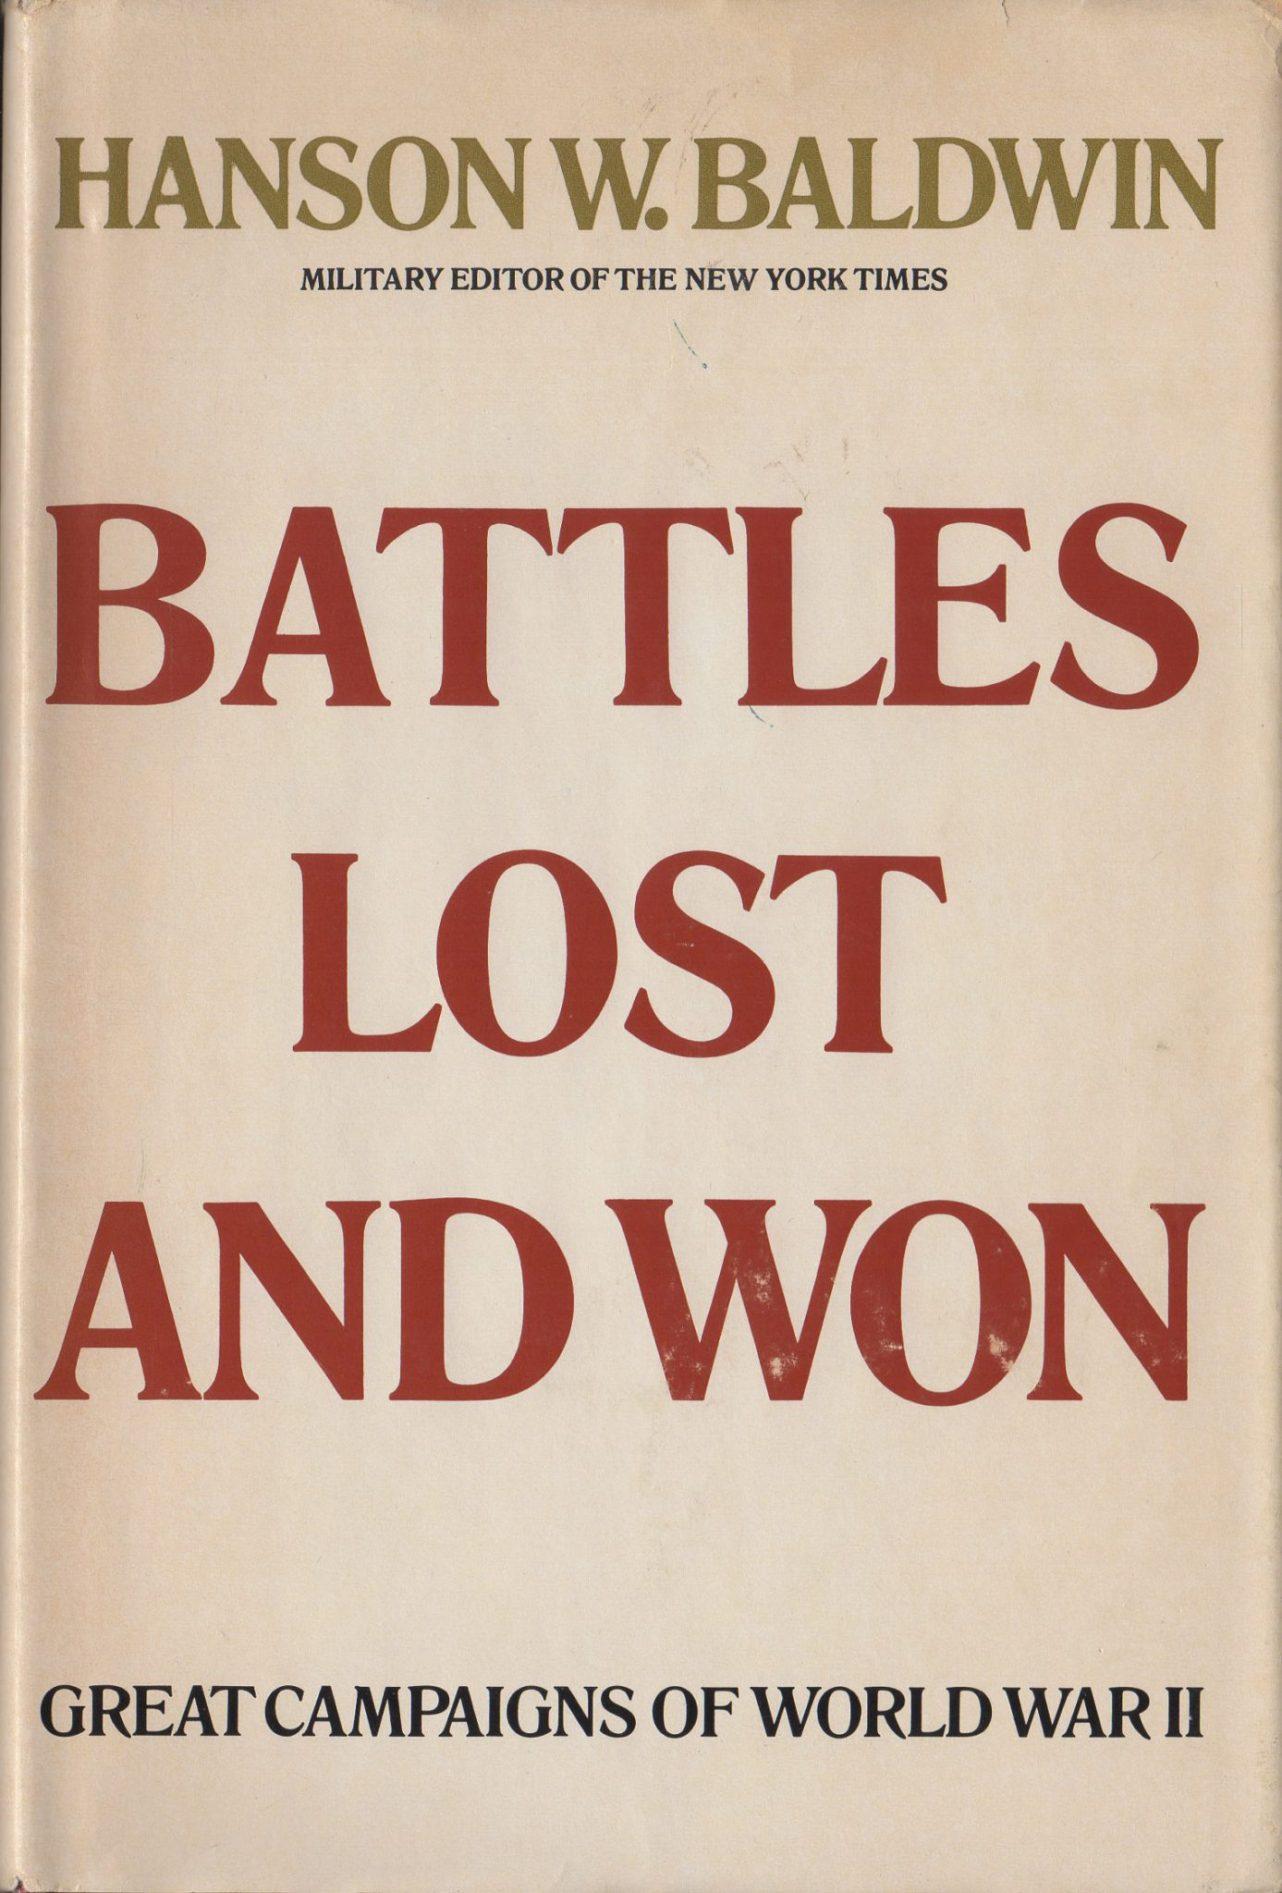 BATTLES LOST AND WON: Great Campaigns of World War II - Hanson W  Baldwin,  1966 HCDJ